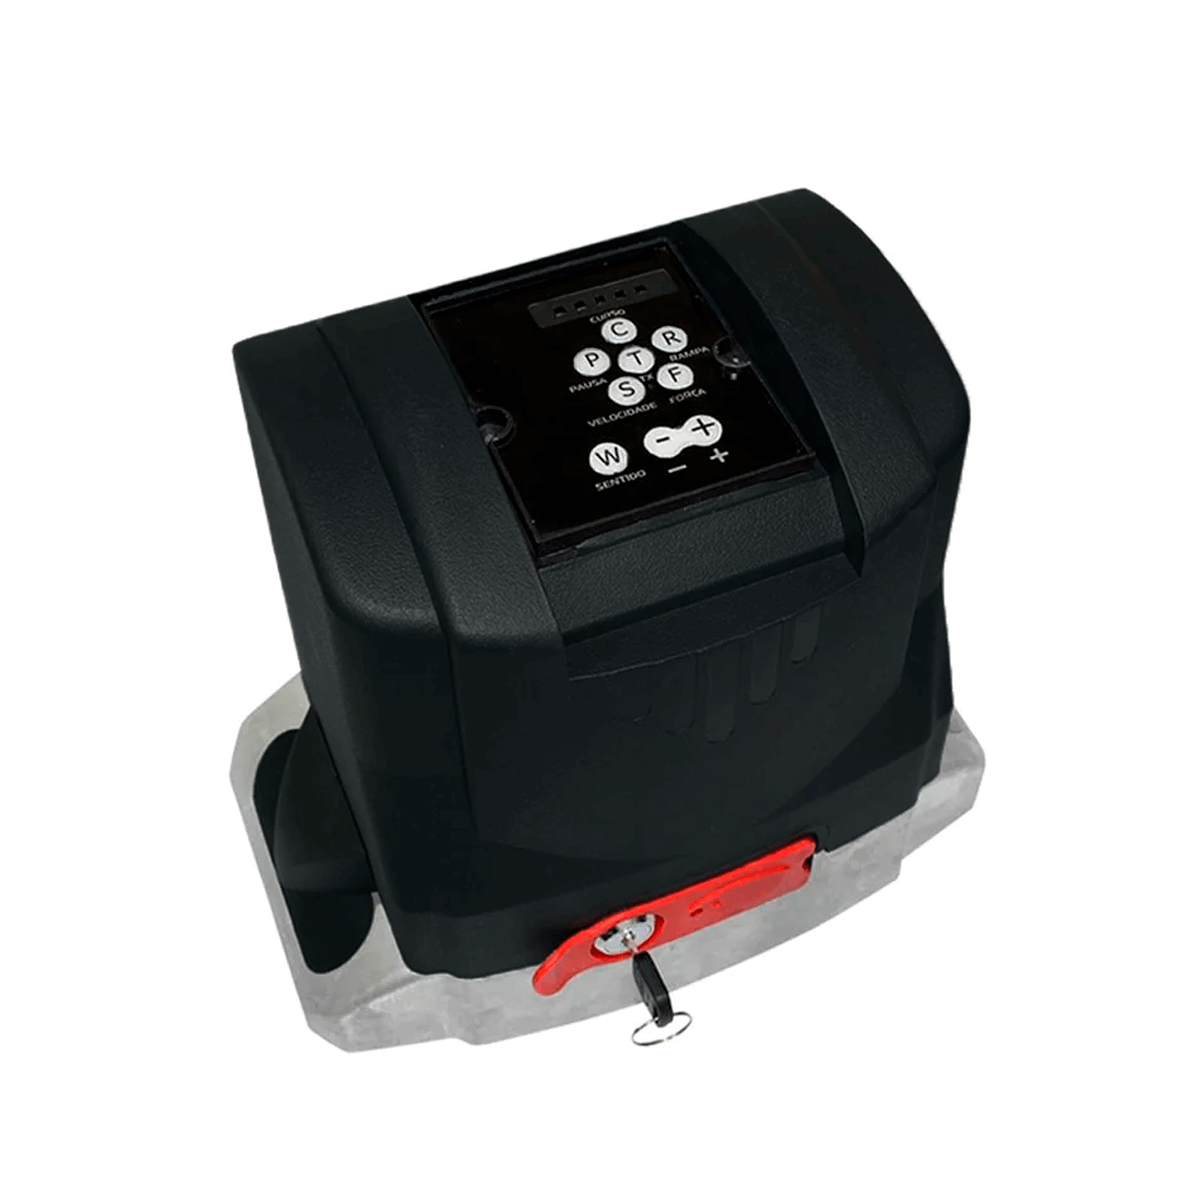 Kit Motor Portão Eletrônico Garen Dz Niid Bivolt Rápido